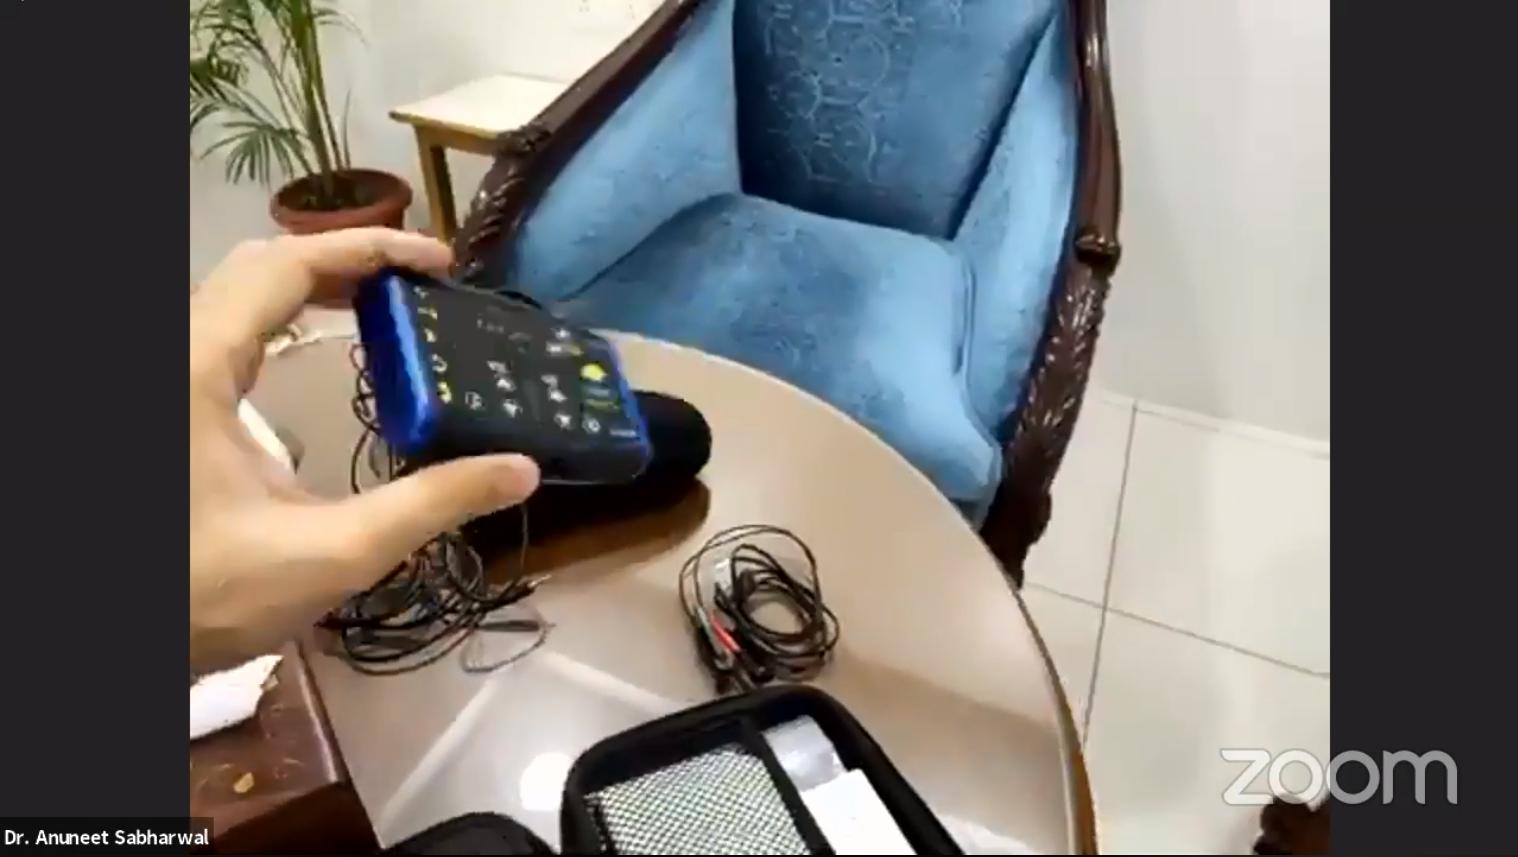 Audio-Visual Entrainment Device